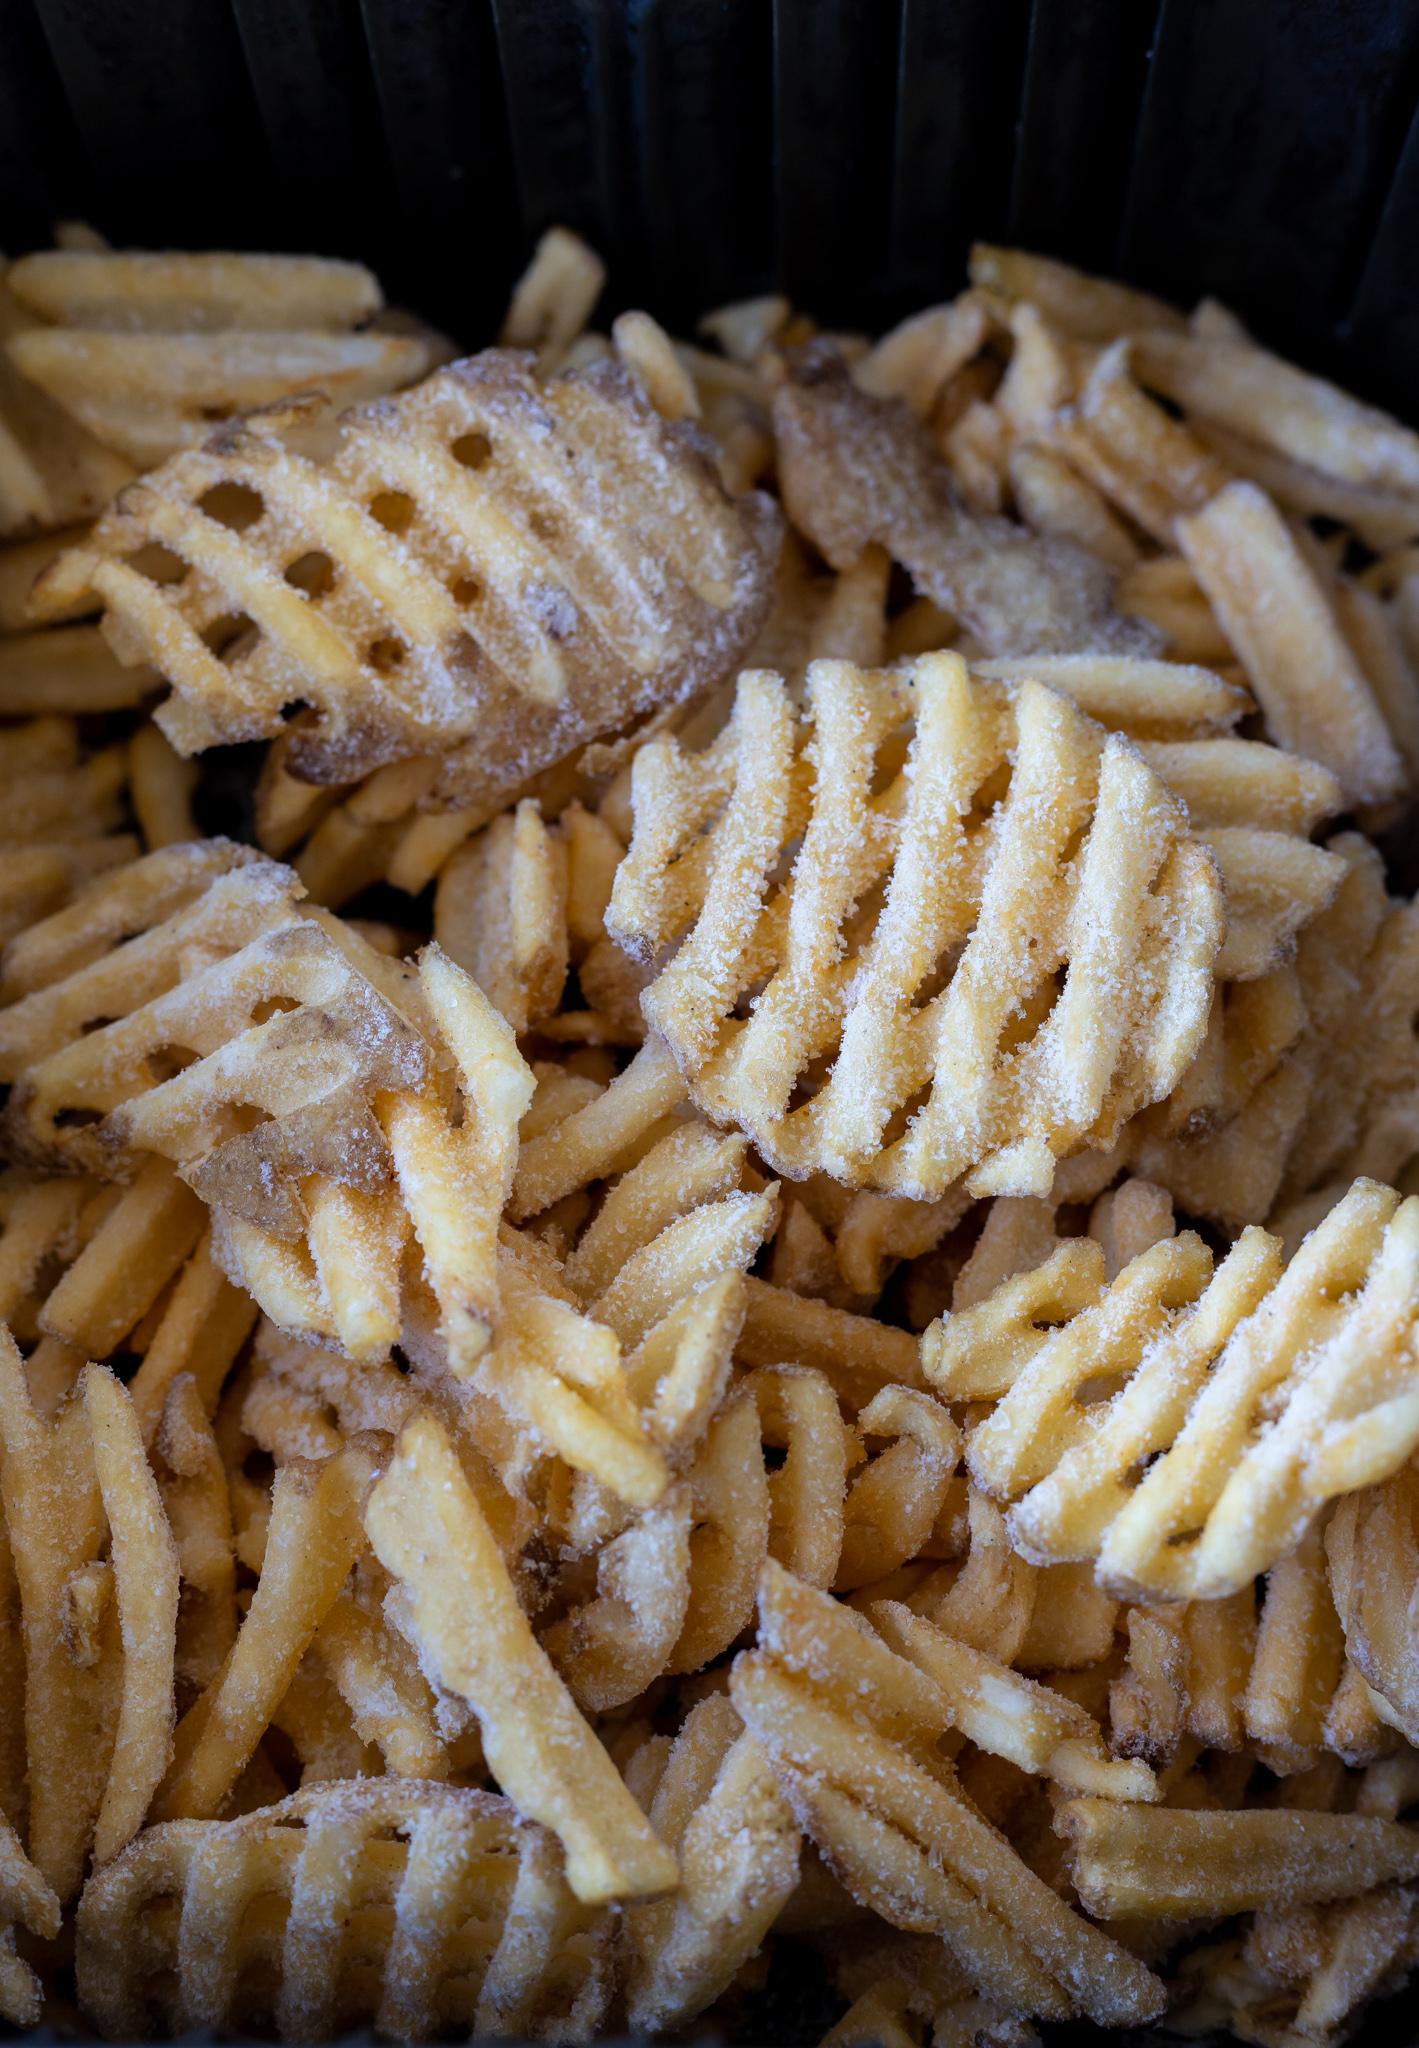 frozen fries in air fryer basket